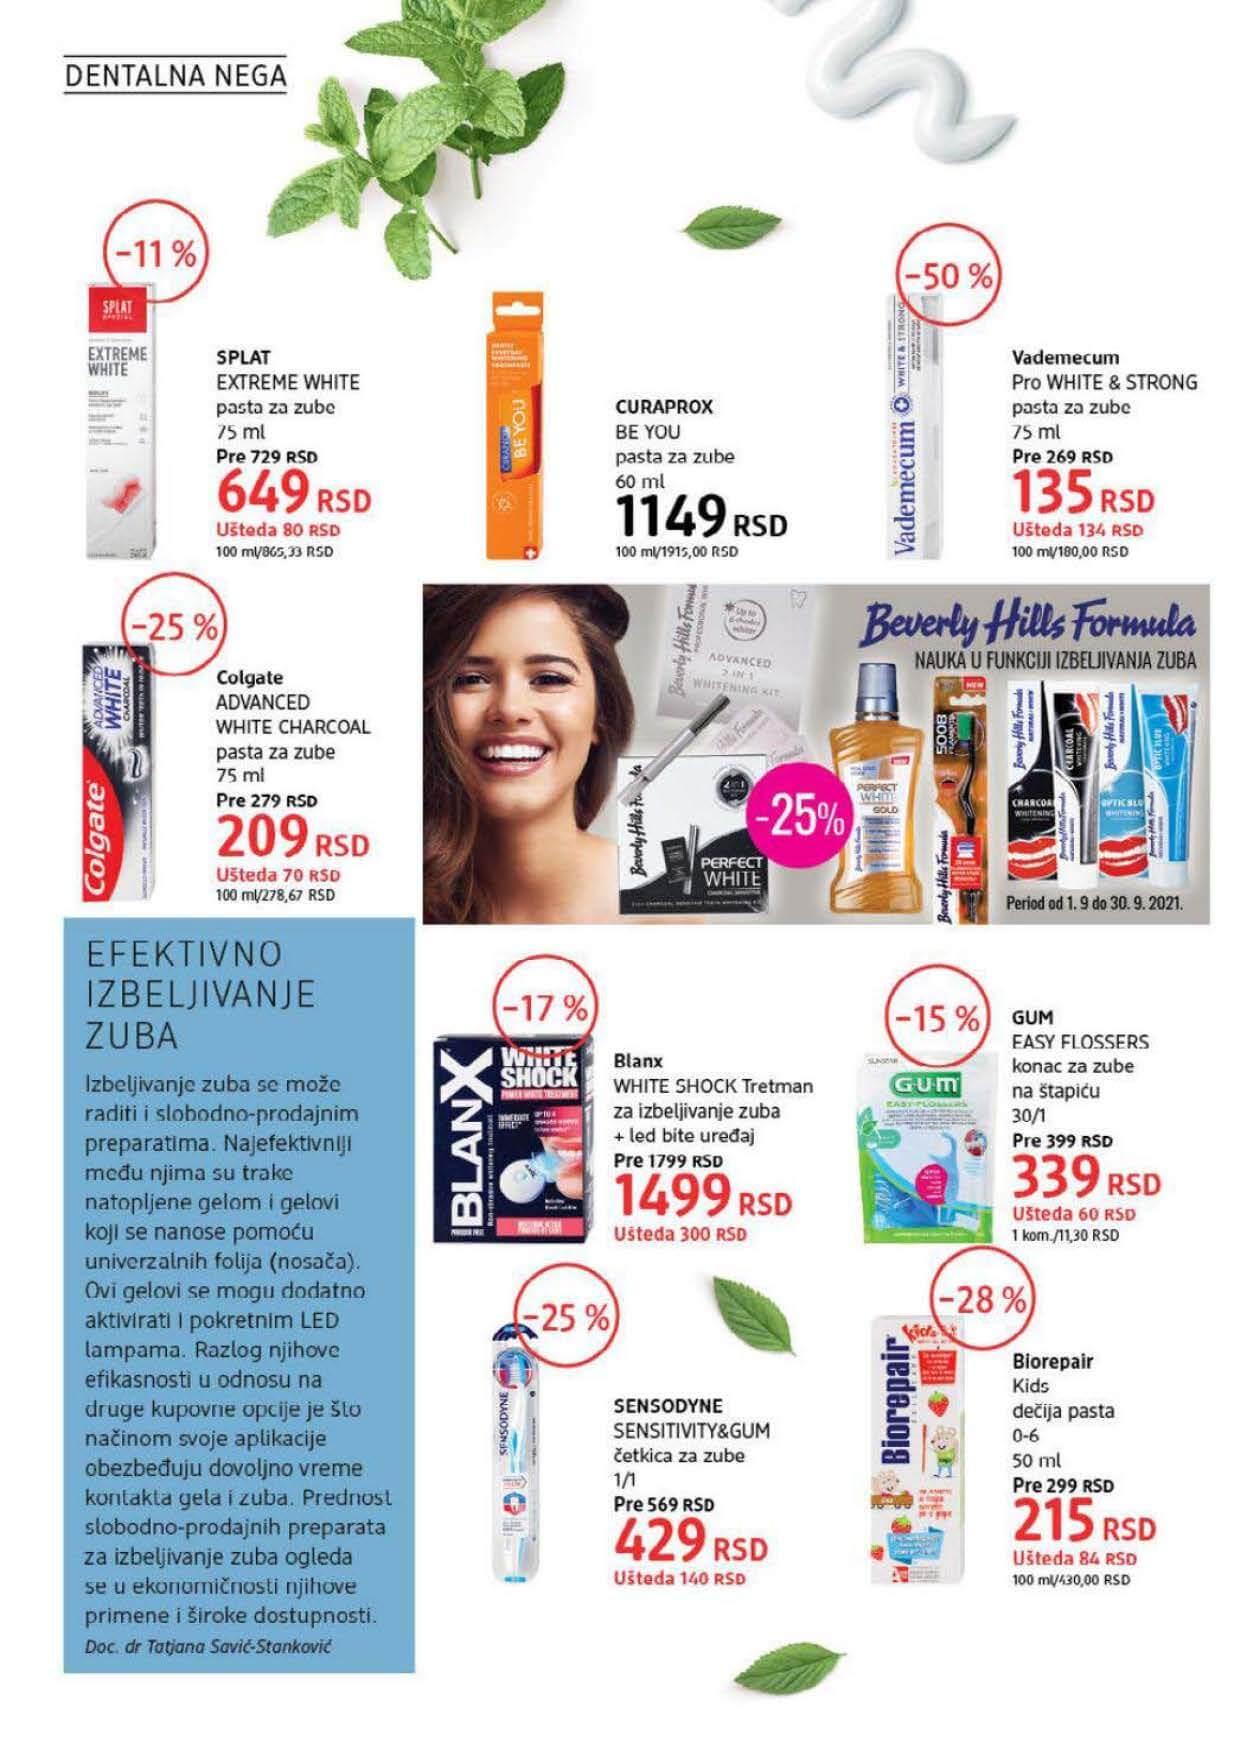 DM Katalog Srbija SEPTEMBAR 2021 1.9.2021. 30.9.2021. Page 20